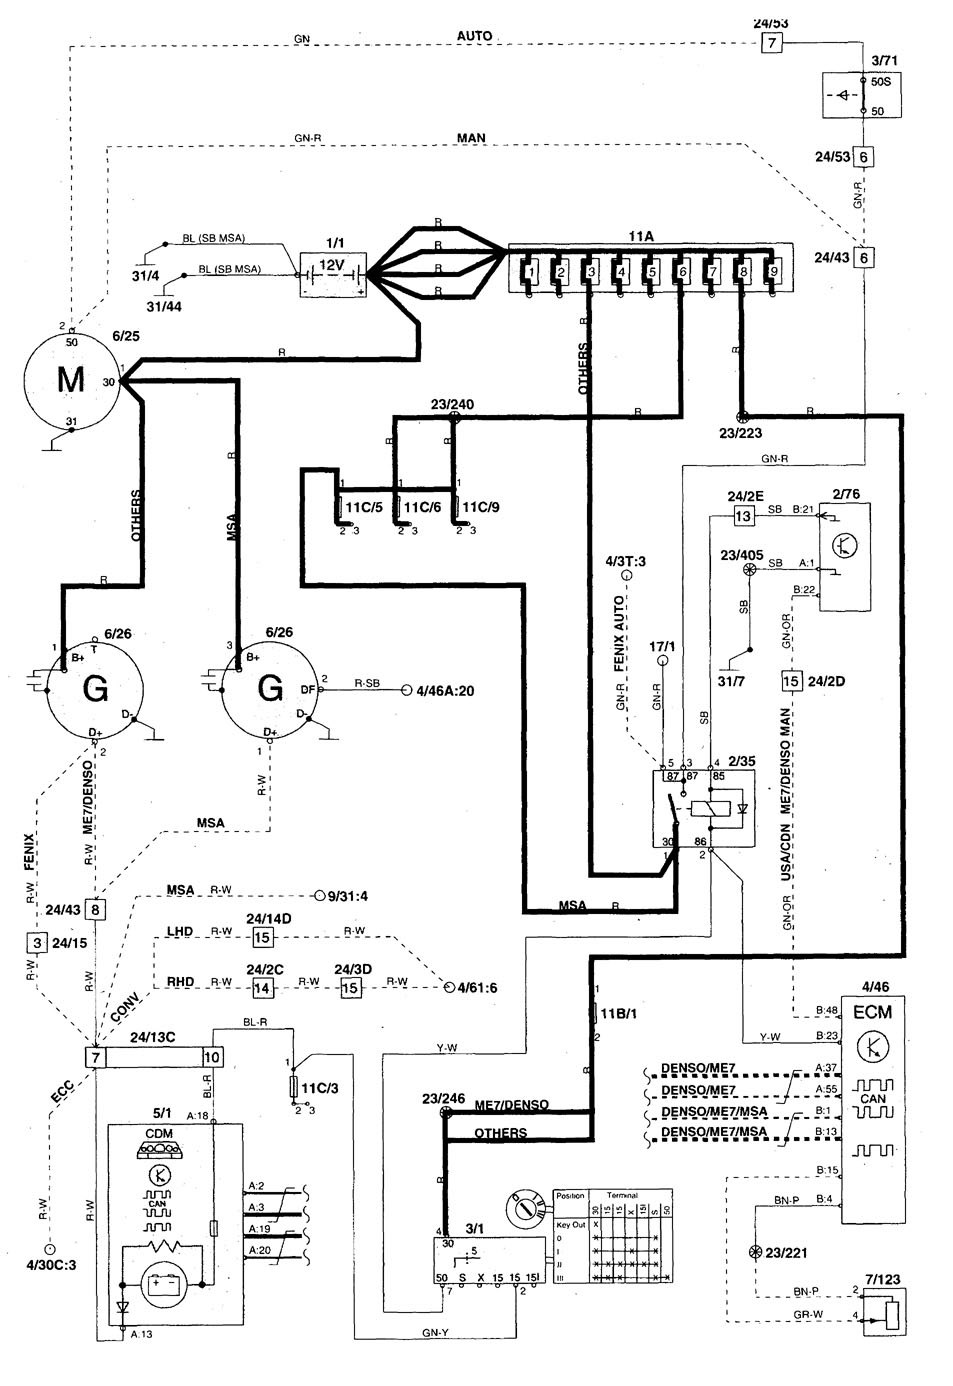 GENUINE VOLVO S40 V40 1996-2004 UNDER BONNET FUSE BOX 30859714 7254-1985